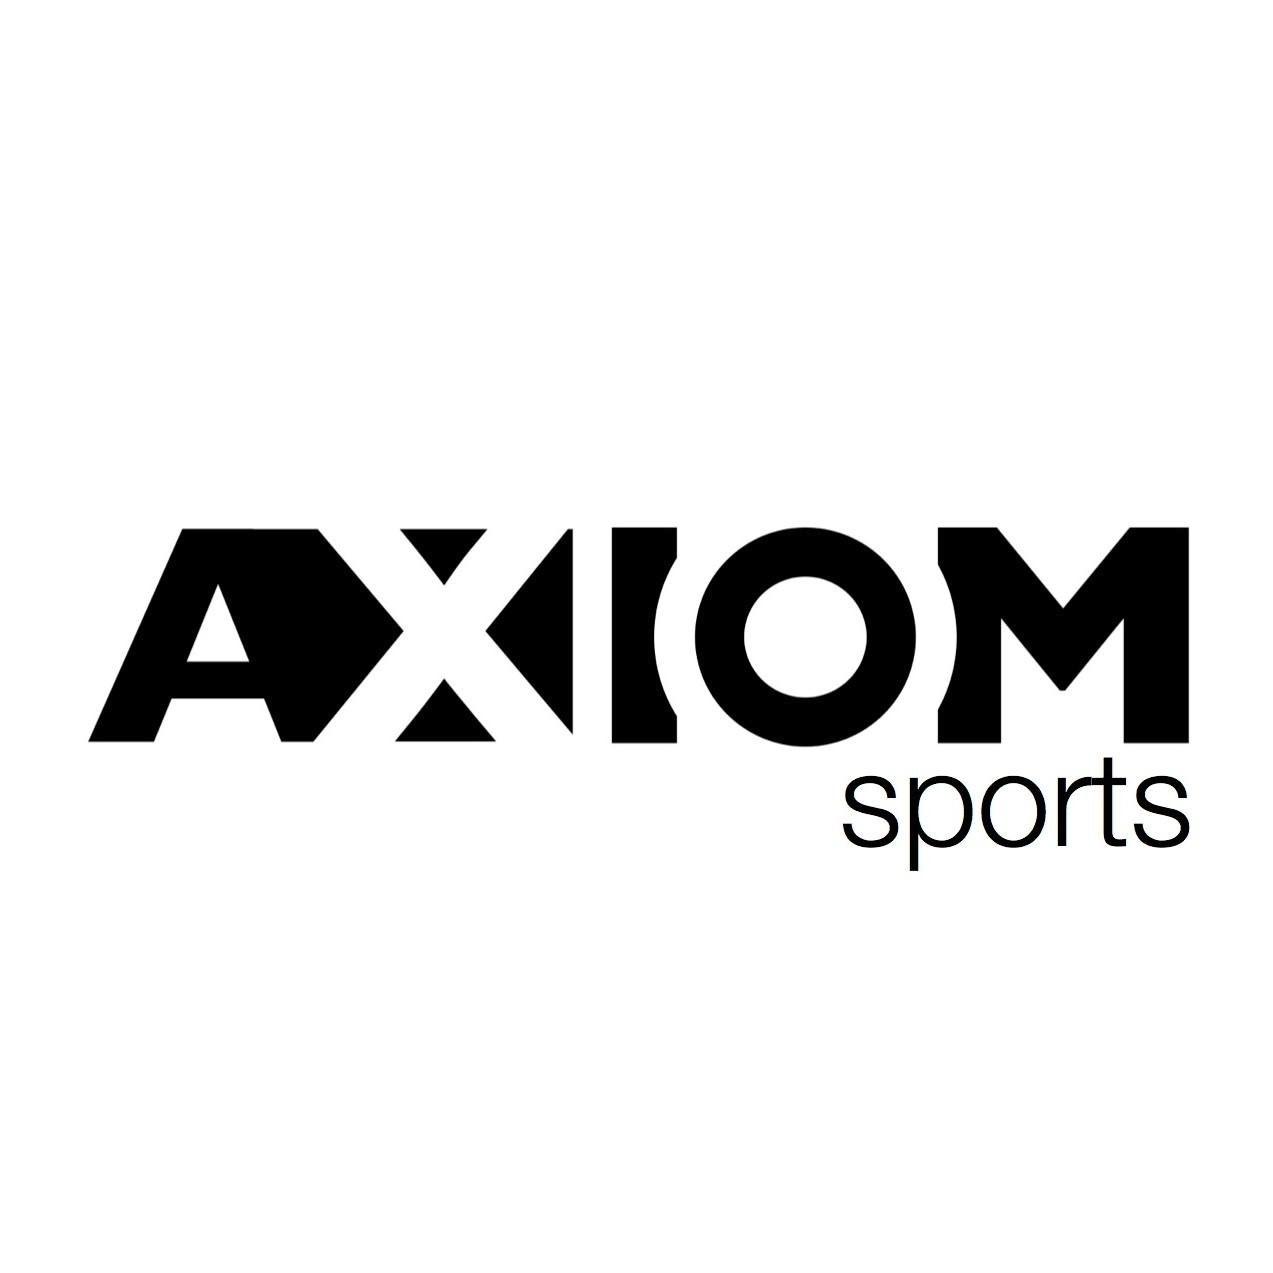 AXIOM SPORTS